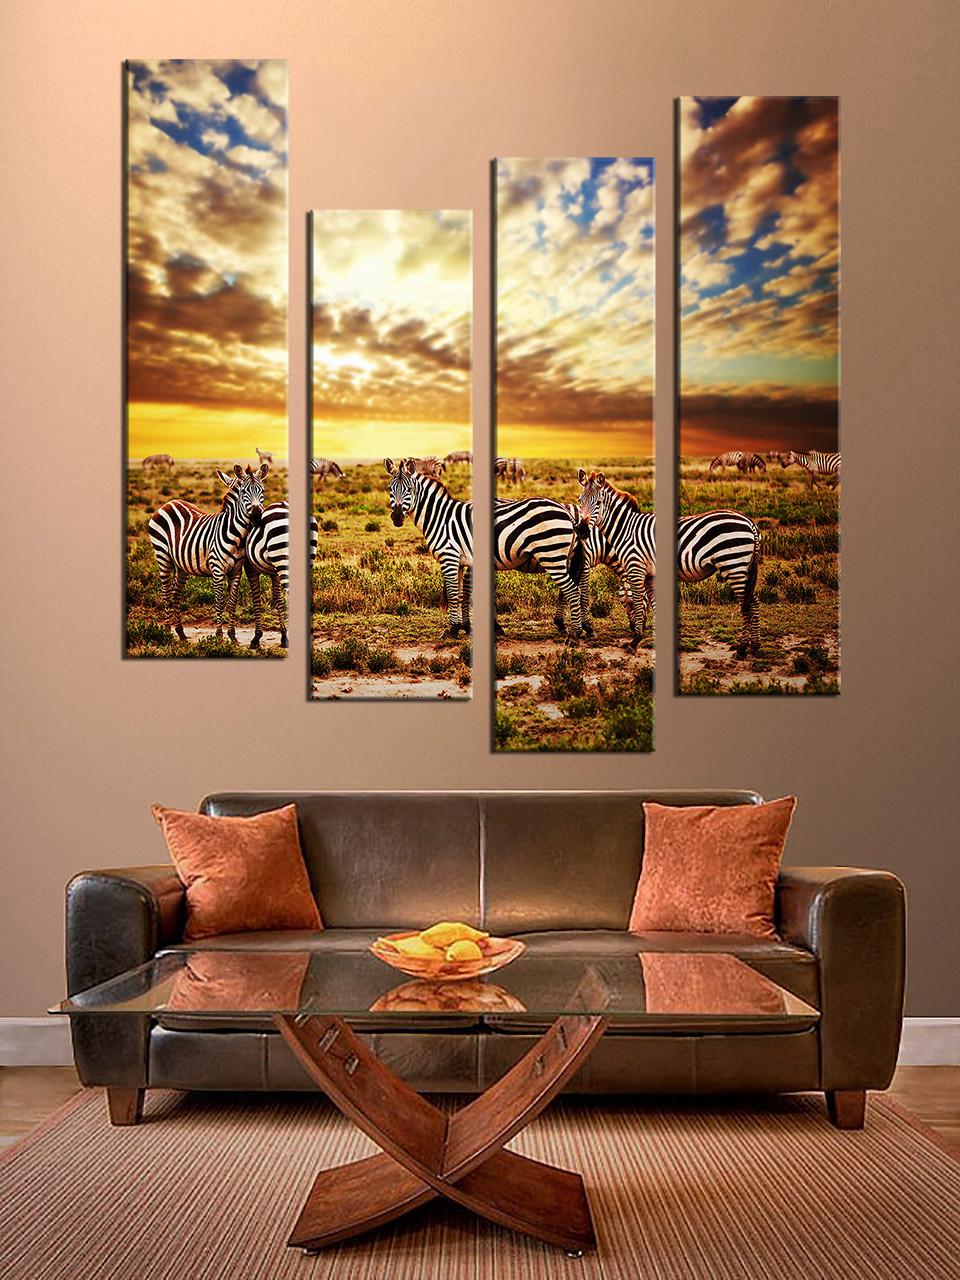 Amazing Living Room Decor, 4 Piece Wall Art, Zebra Pictures, Animal Art, Wildlife